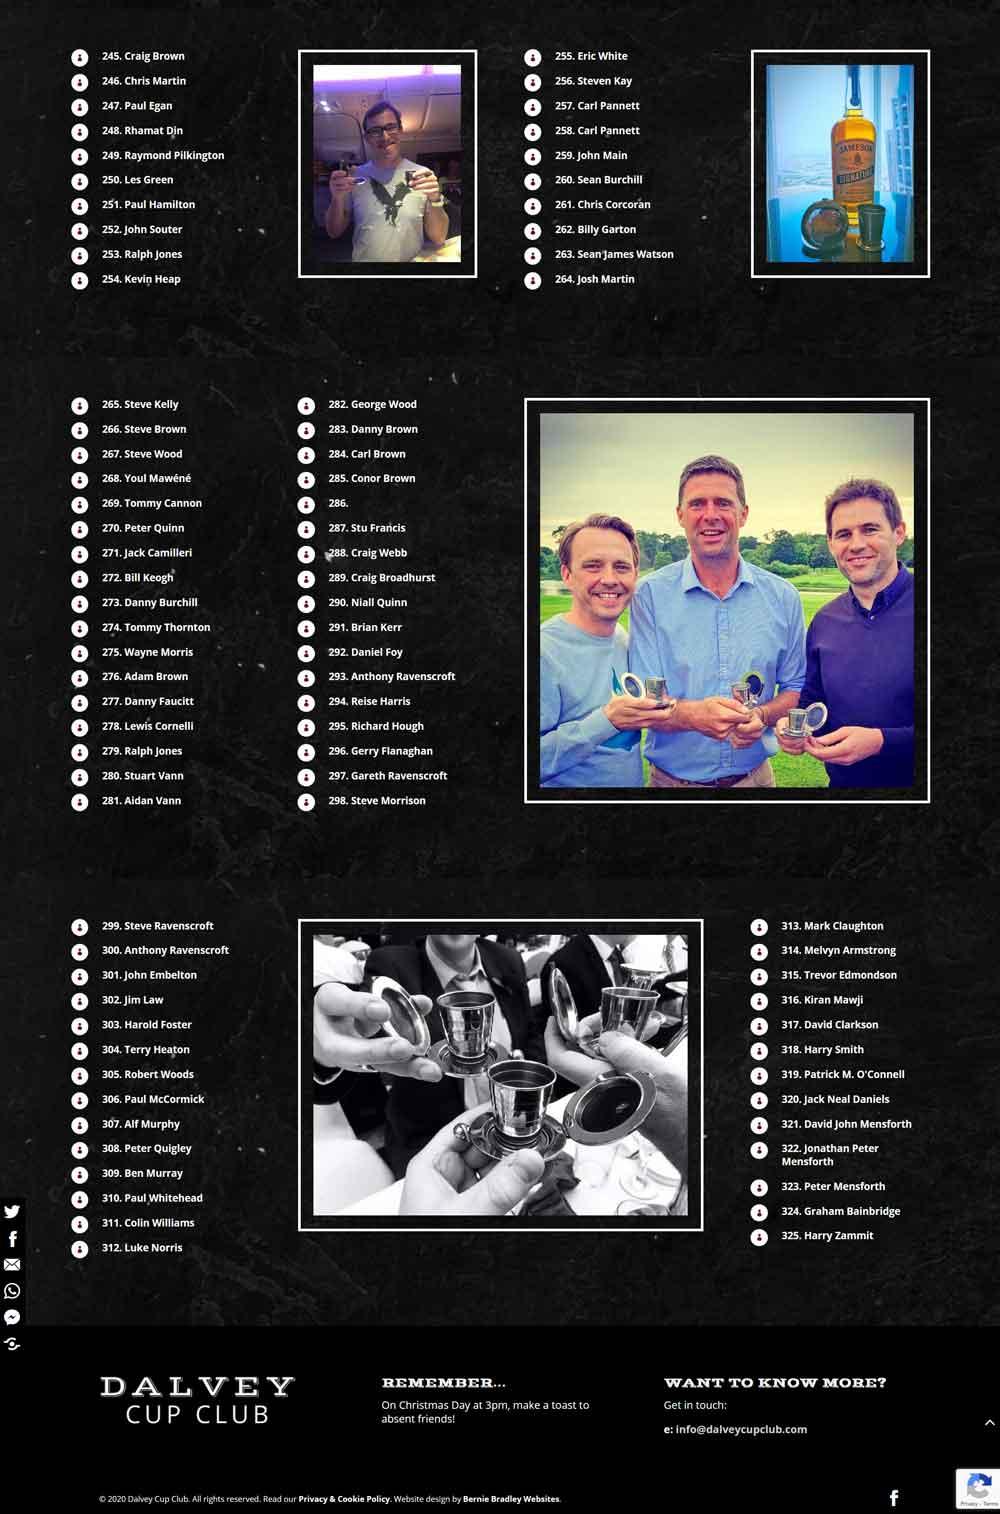 Members List - over 300 Dalvey Cup Club Members